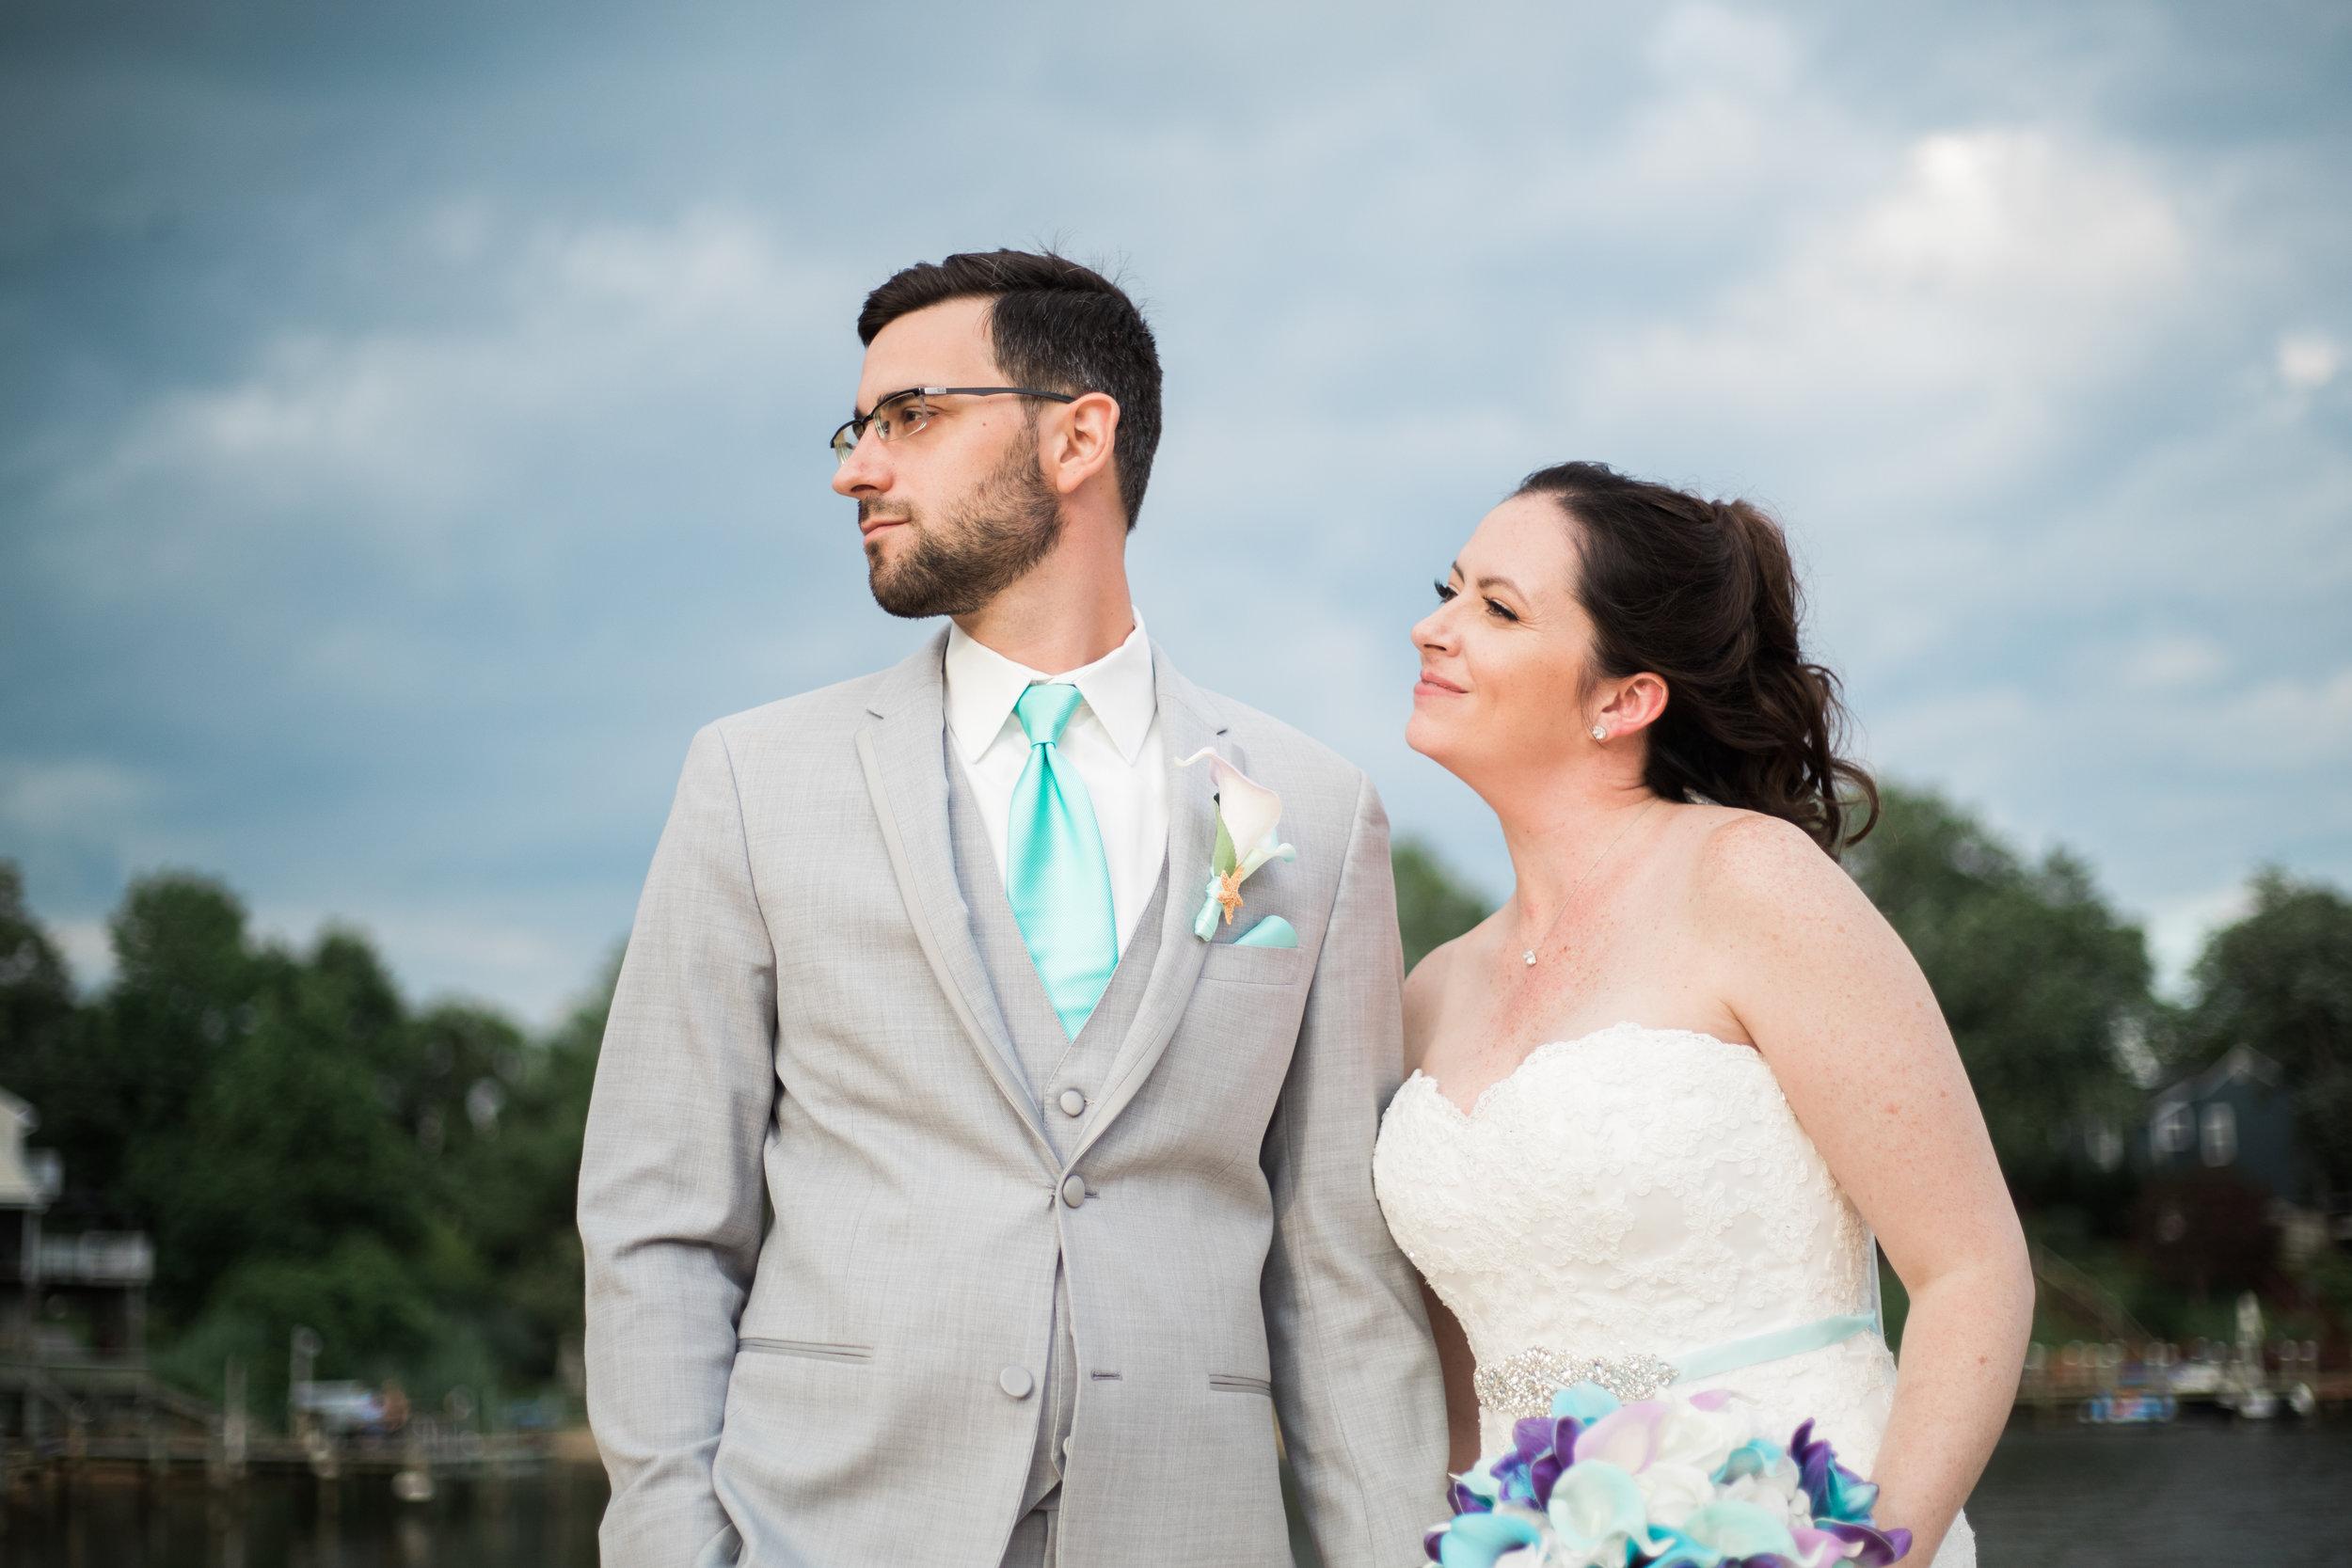 Bleus on the water Wedding Glen Burnie Maryland Wedding Photographers Megapixels Media Photography (1 of 91).jpg